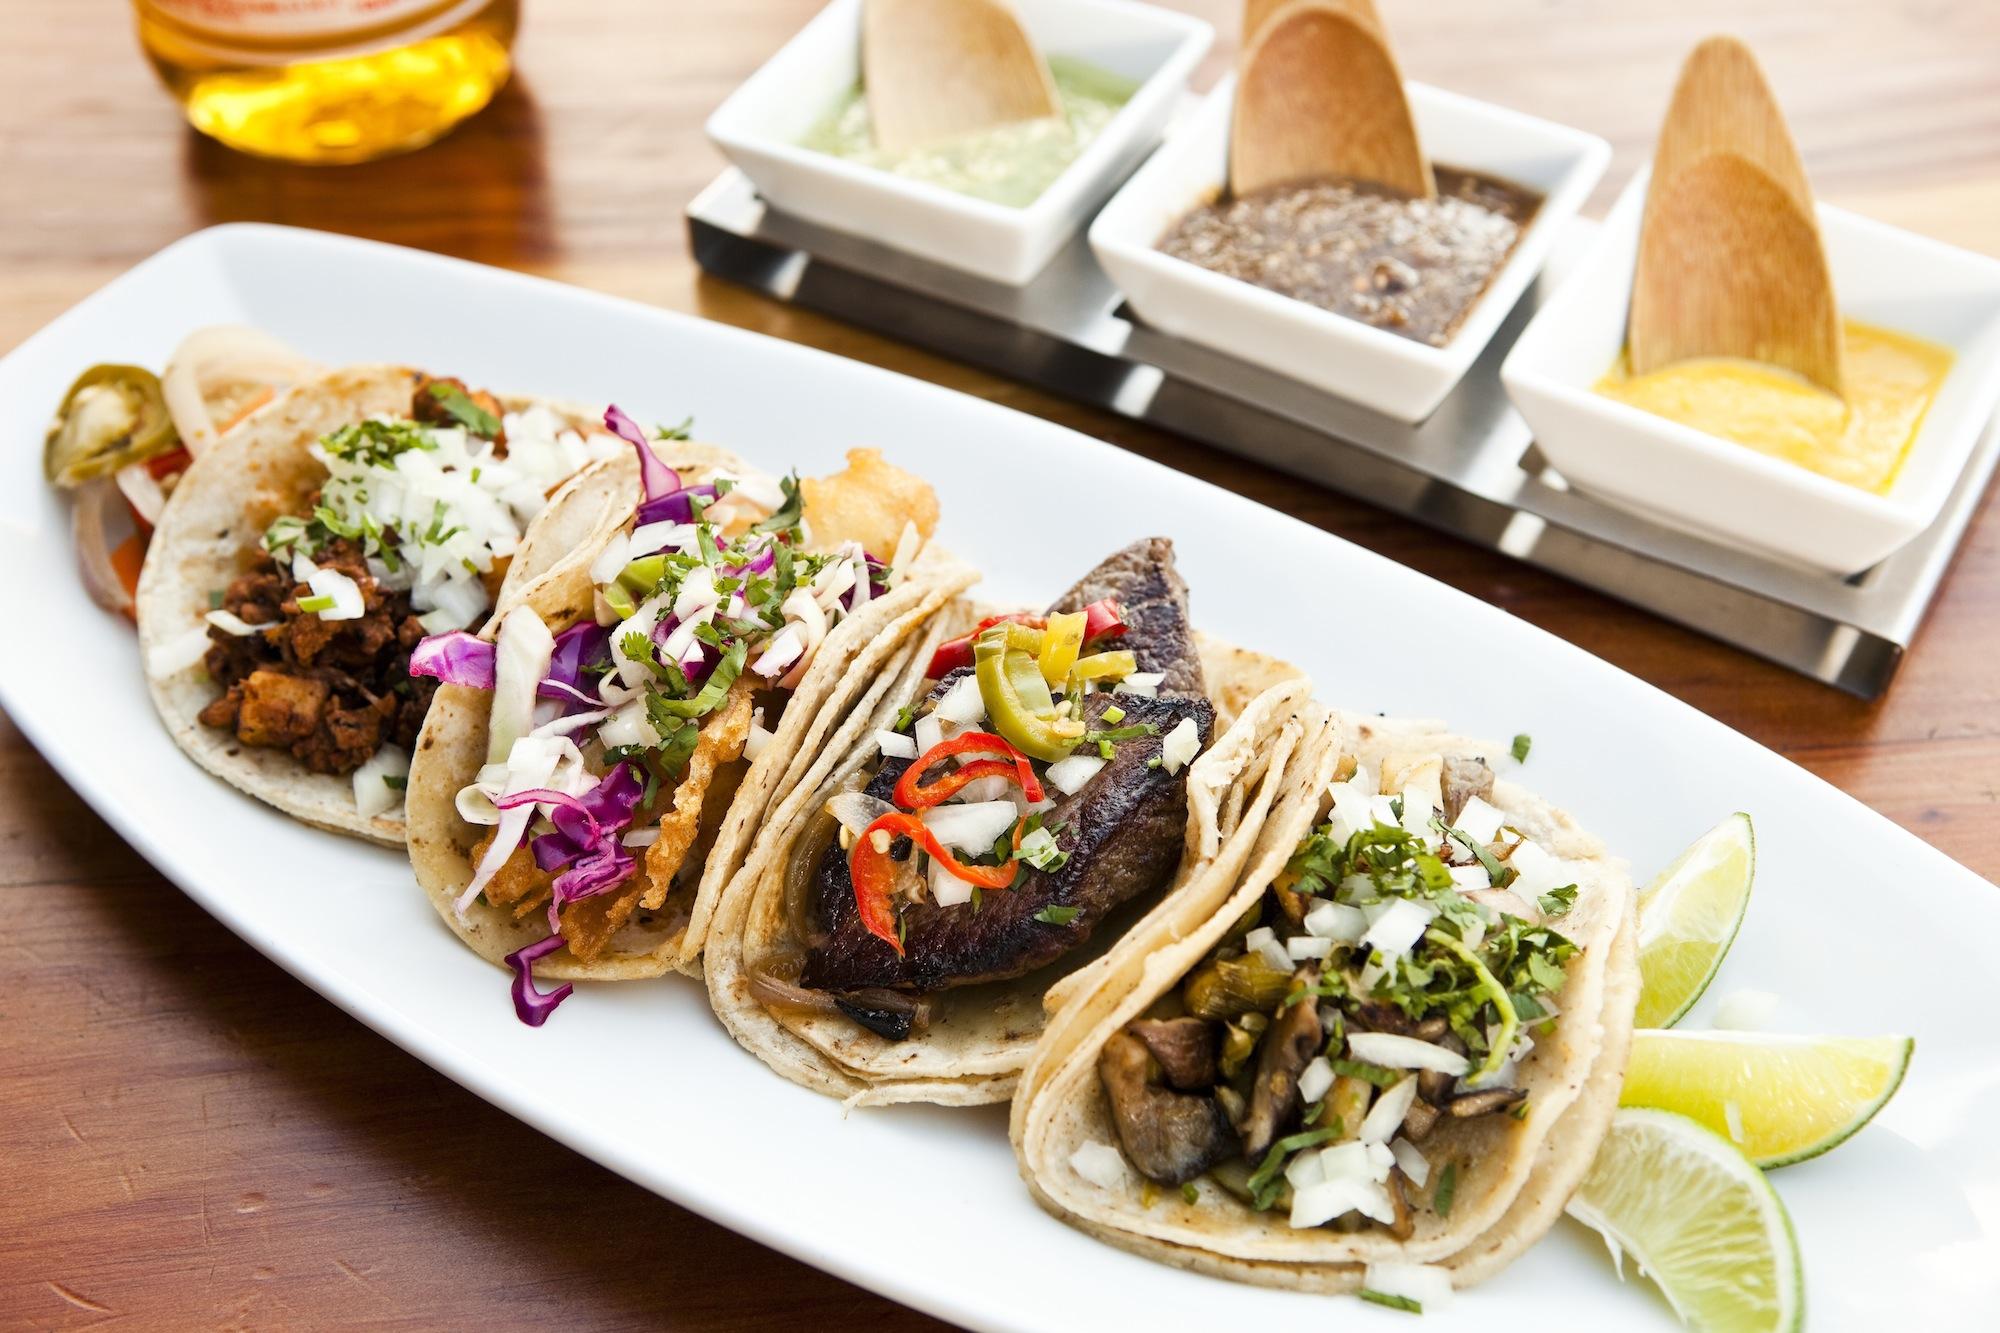 Taco plate at Tacolicious restaurant in San Francisco, CA.